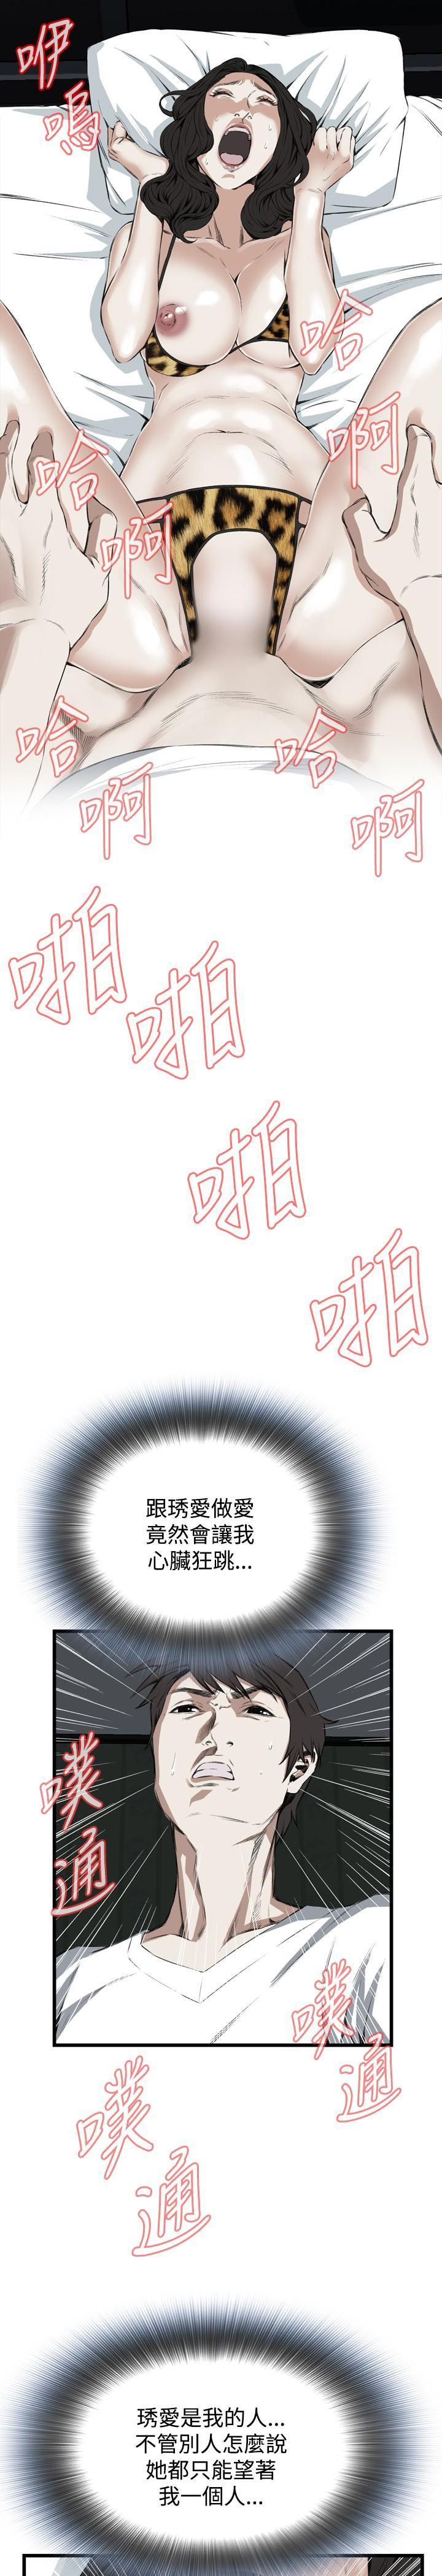 Take a Peek 偷窥 Ch.39~55 [Chinese]中文 450